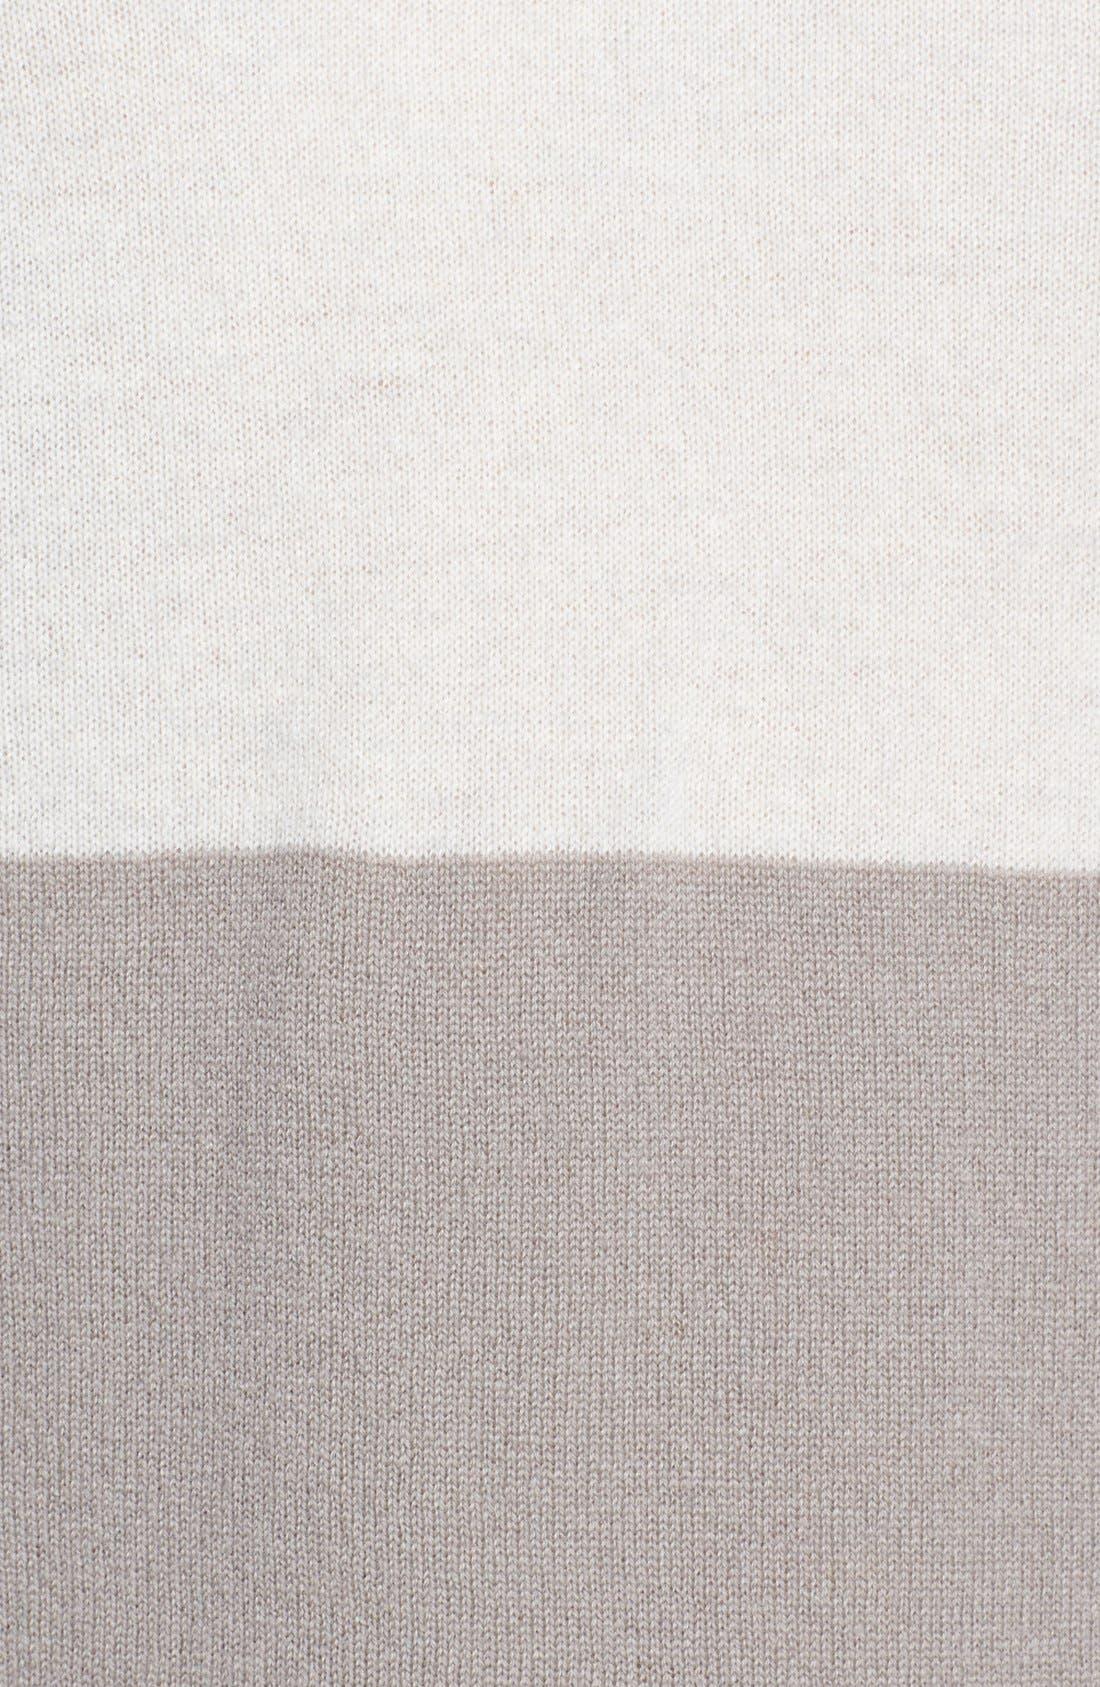 Alternate Image 3  - autumn cashmere Stripe & Solid Cashmere Sweatshirt